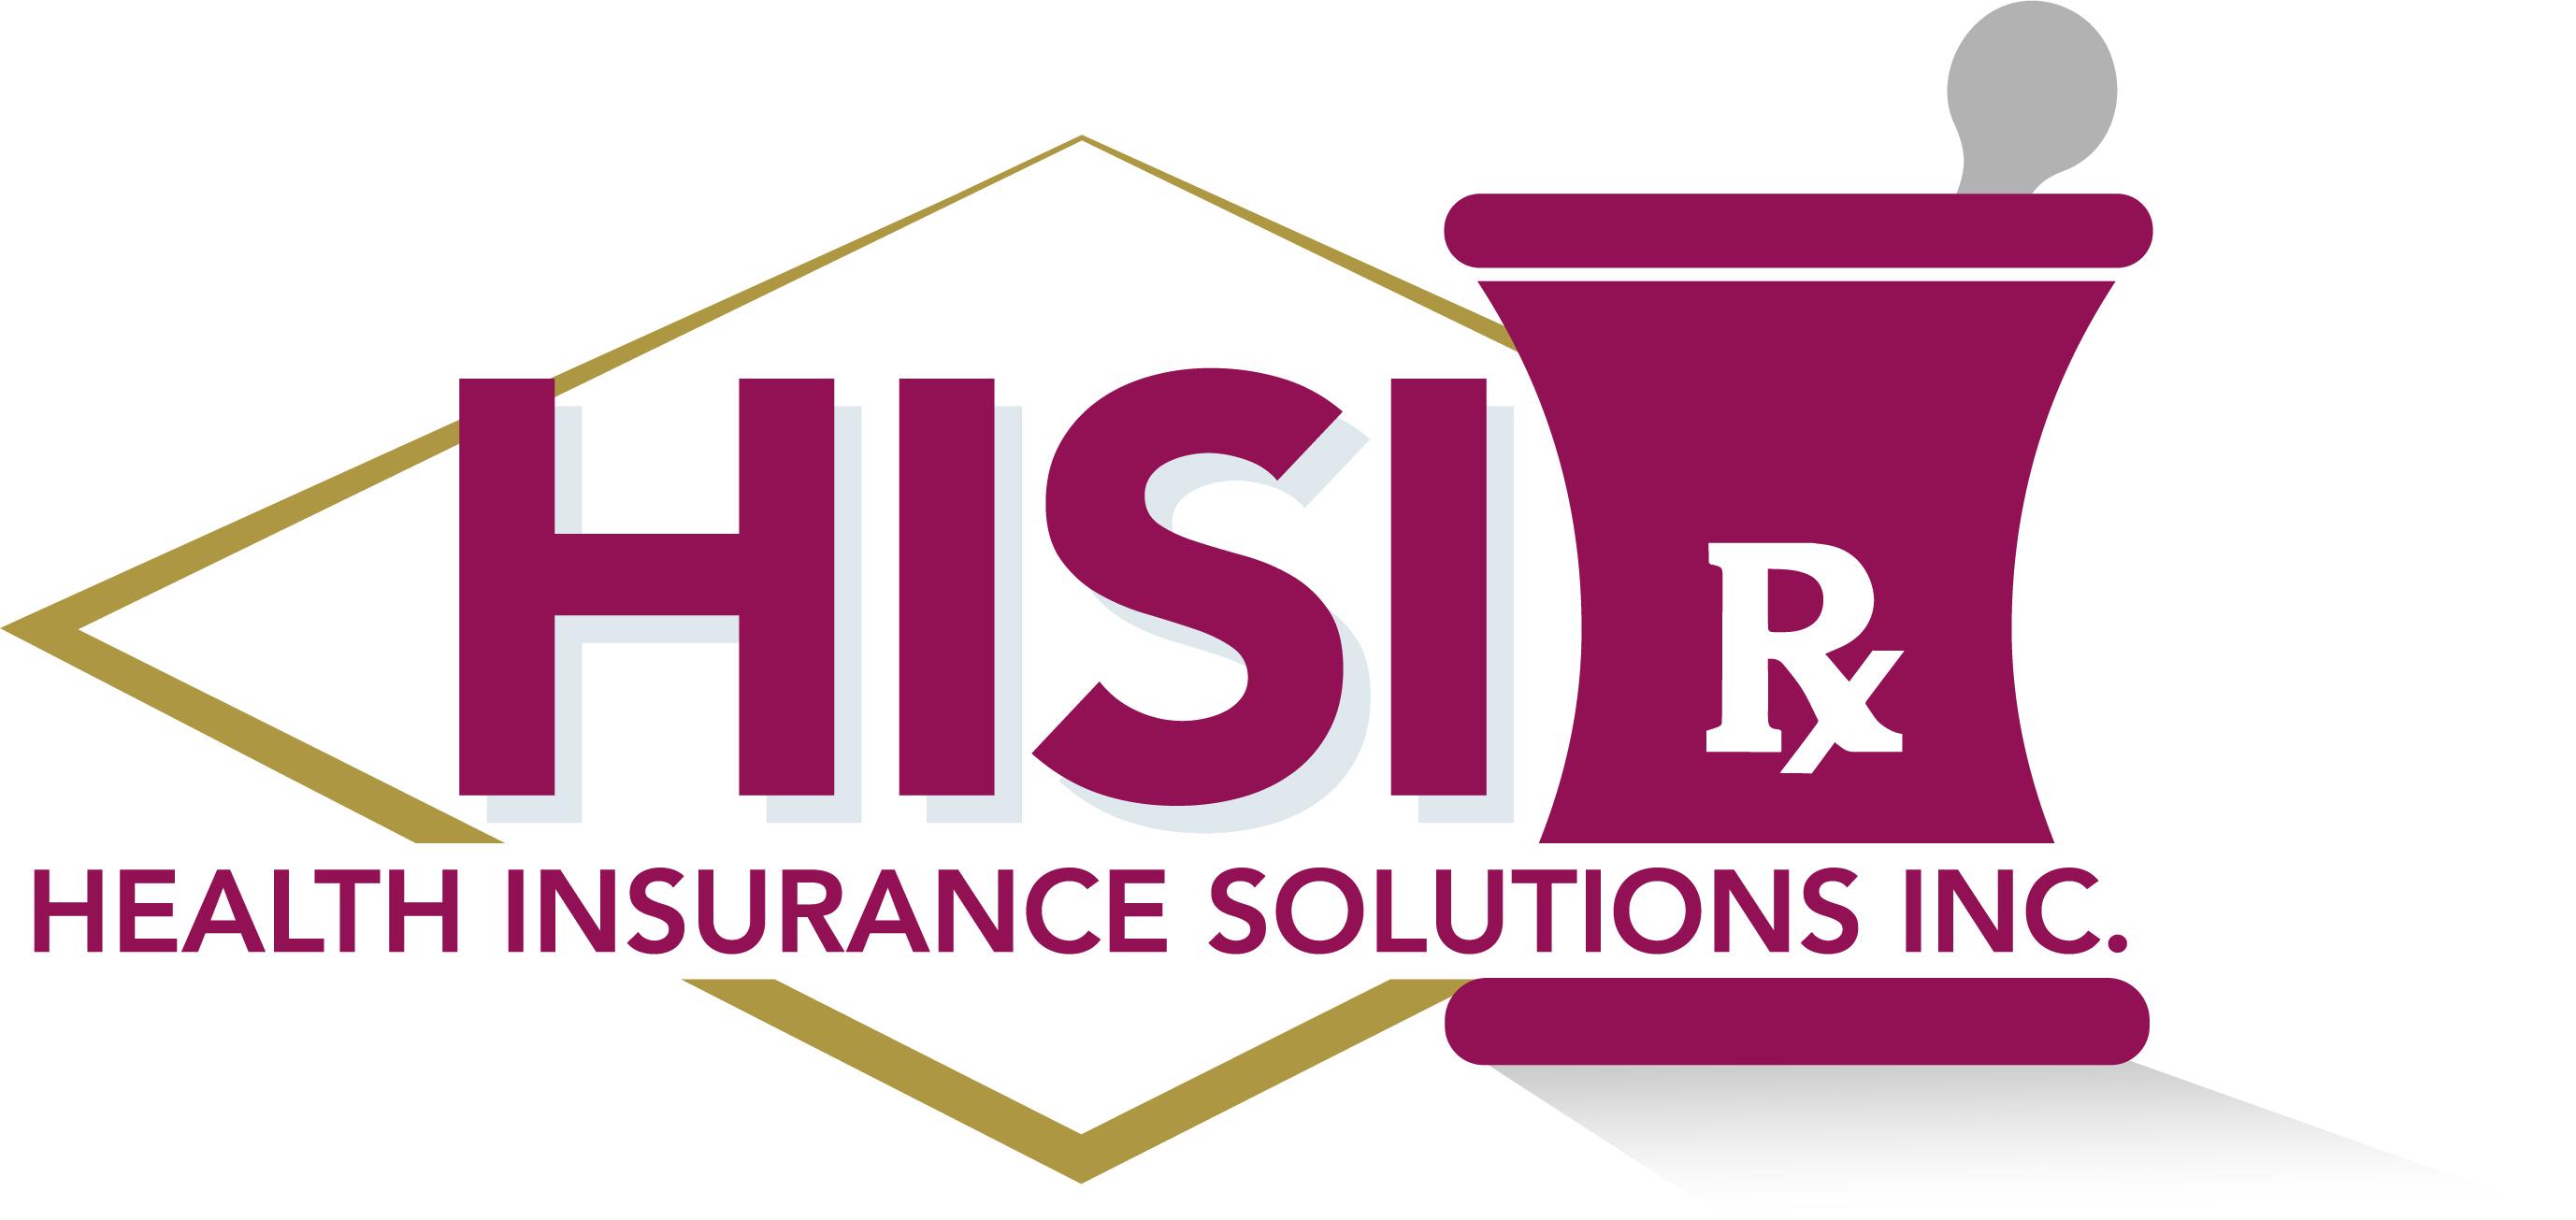 Health insurance Solutions Inc.